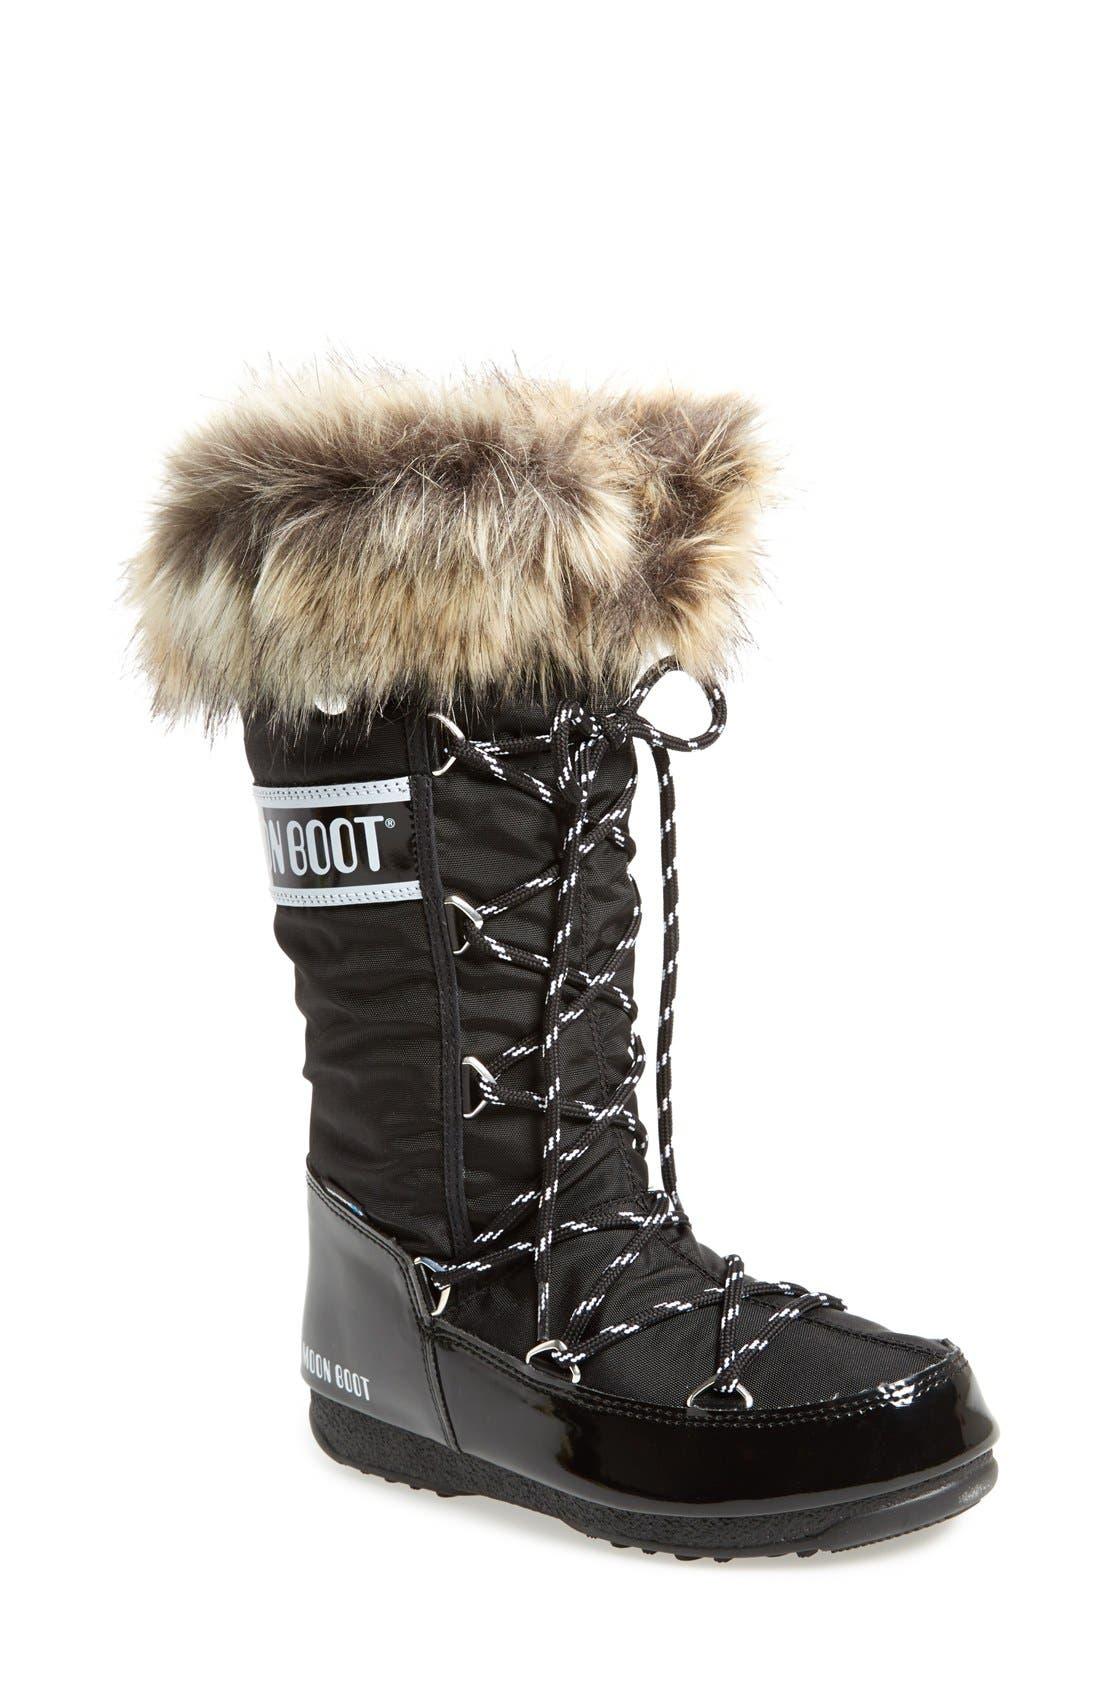 'Monaco' Waterproof Insulated Moon Boot<sup>®</sup>,                         Main,                         color, 001